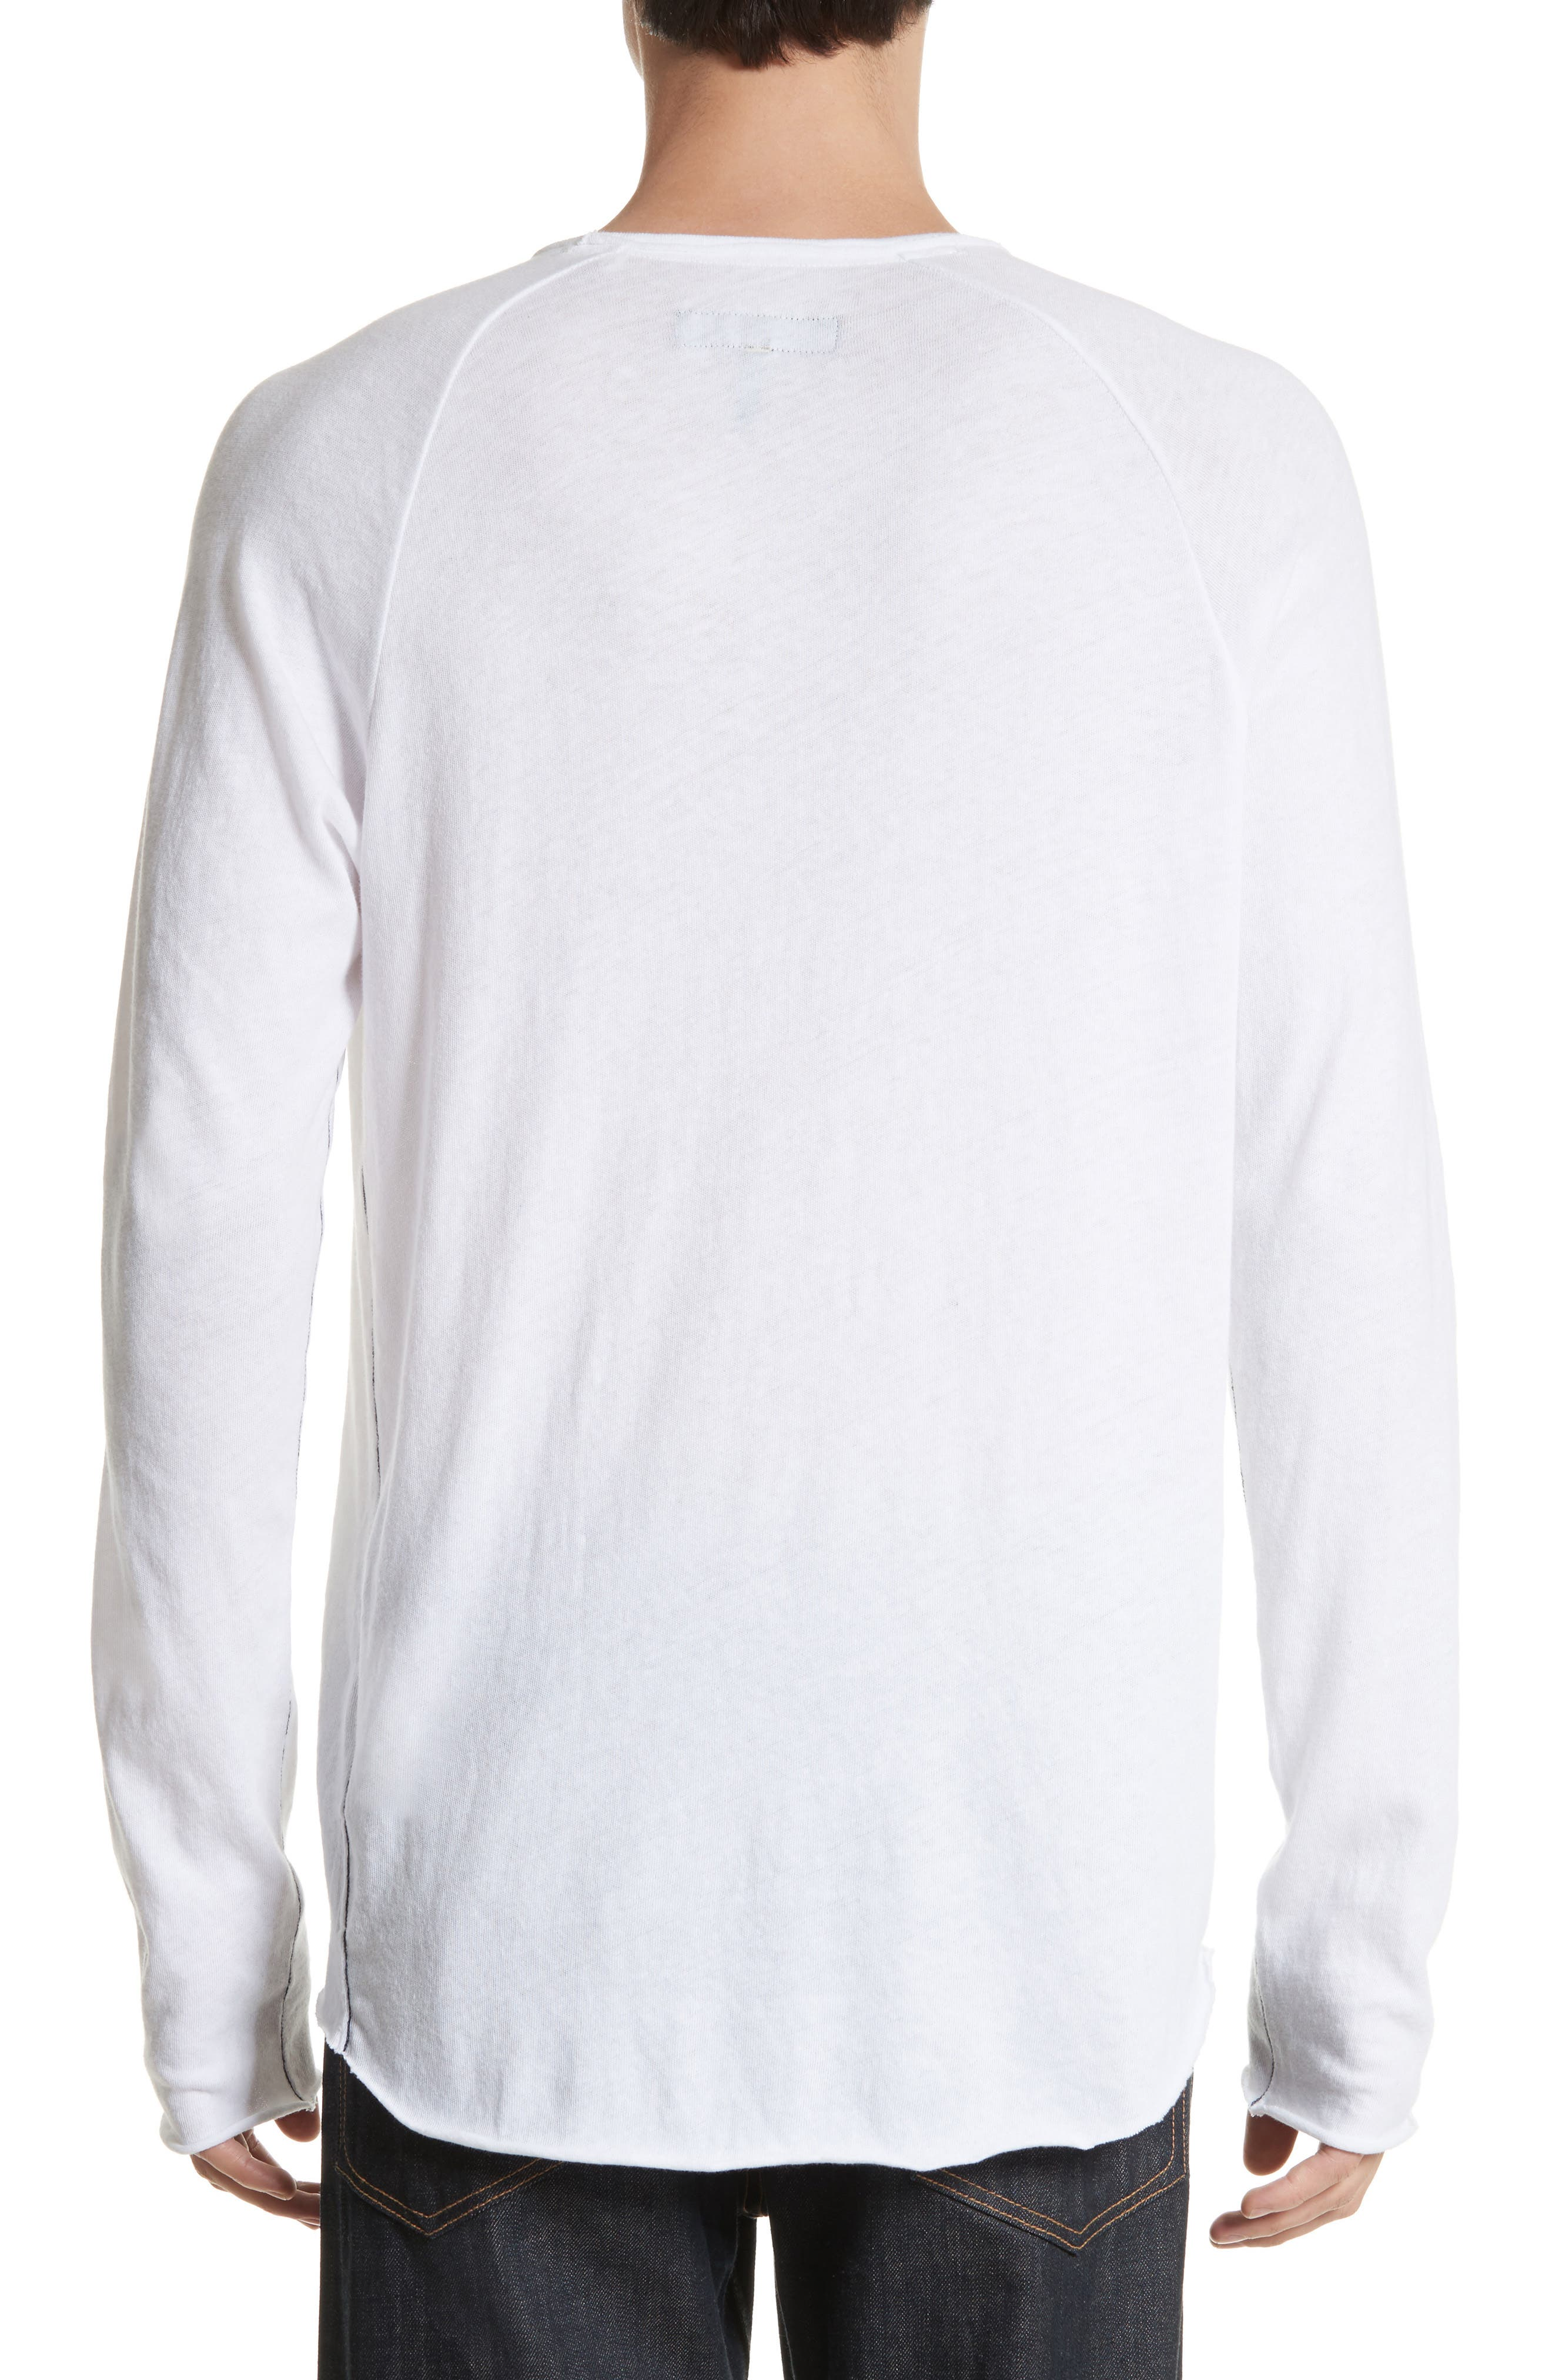 Rupert Long Sleeve T-Shirt,                             Alternate thumbnail 2, color,                             100